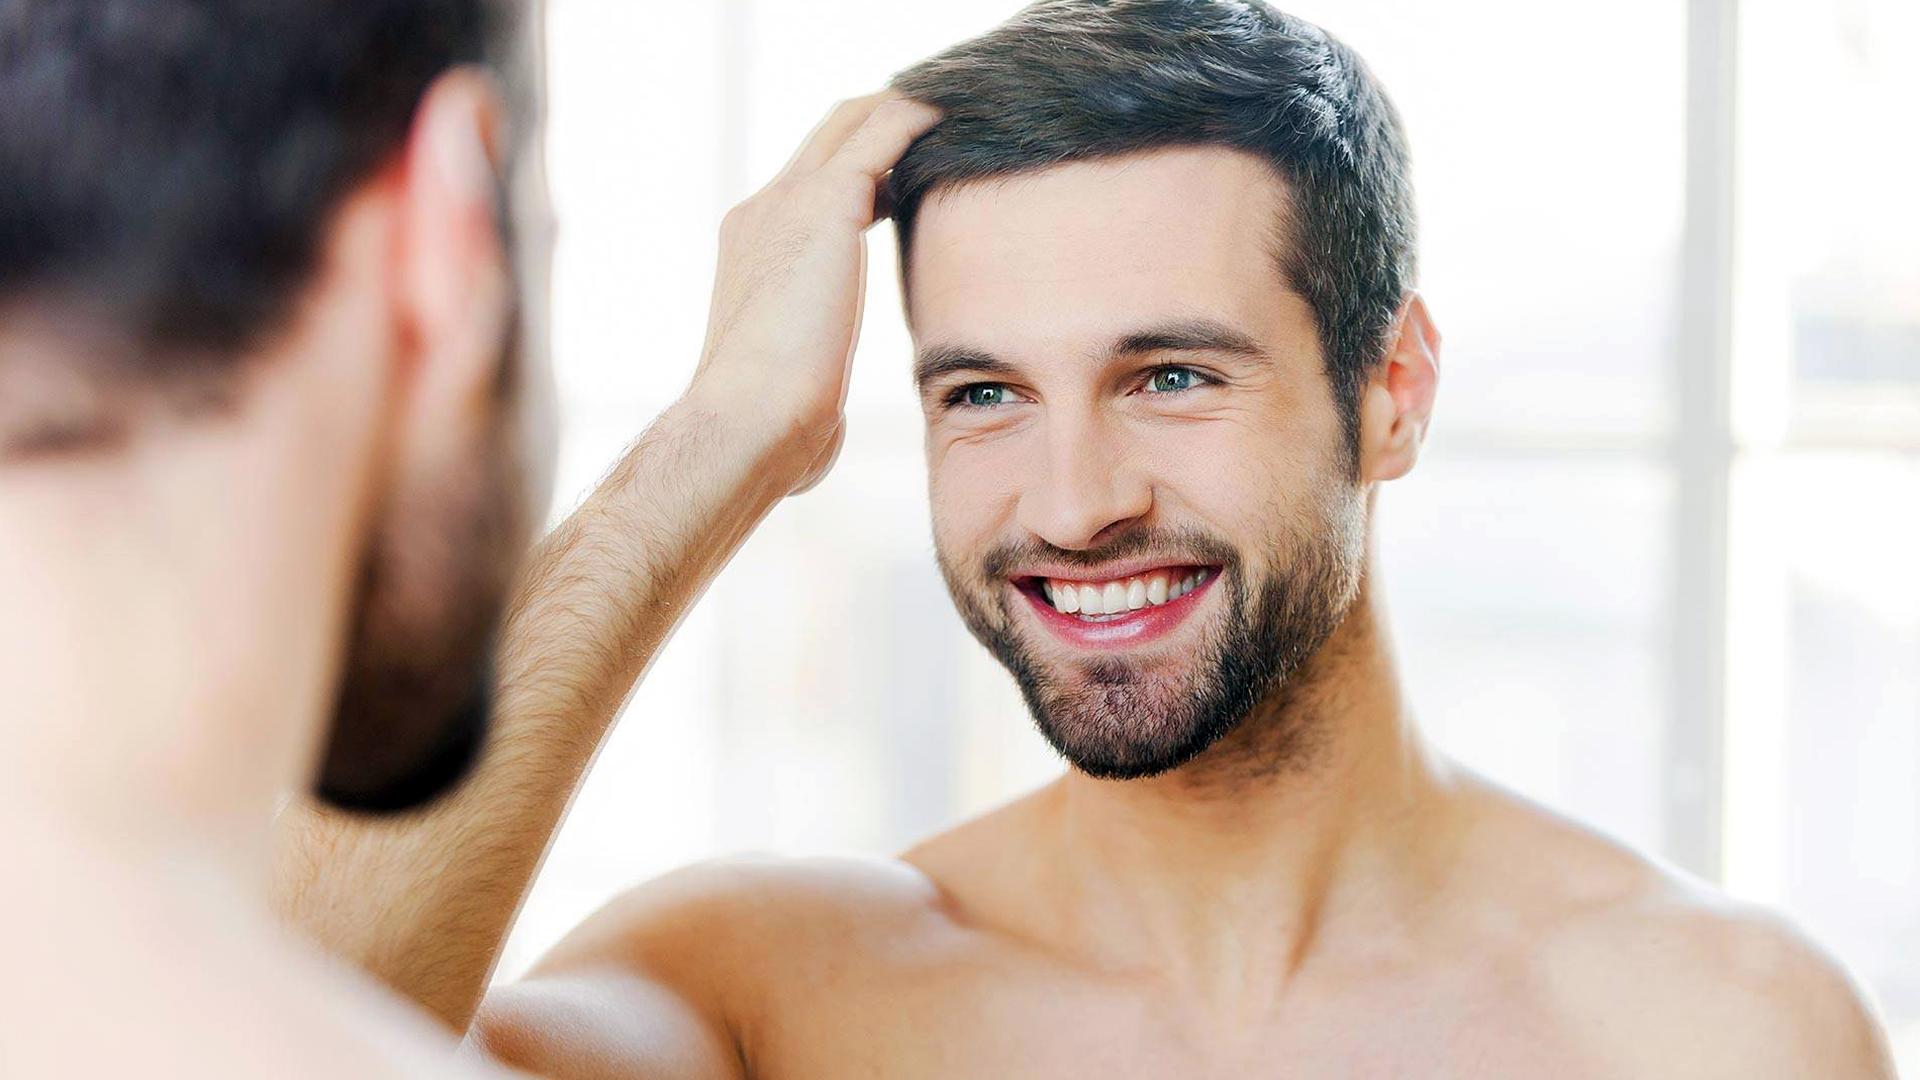 PLATELET-RICH PLASMA (PRP) THERAPY - Hair Restoration